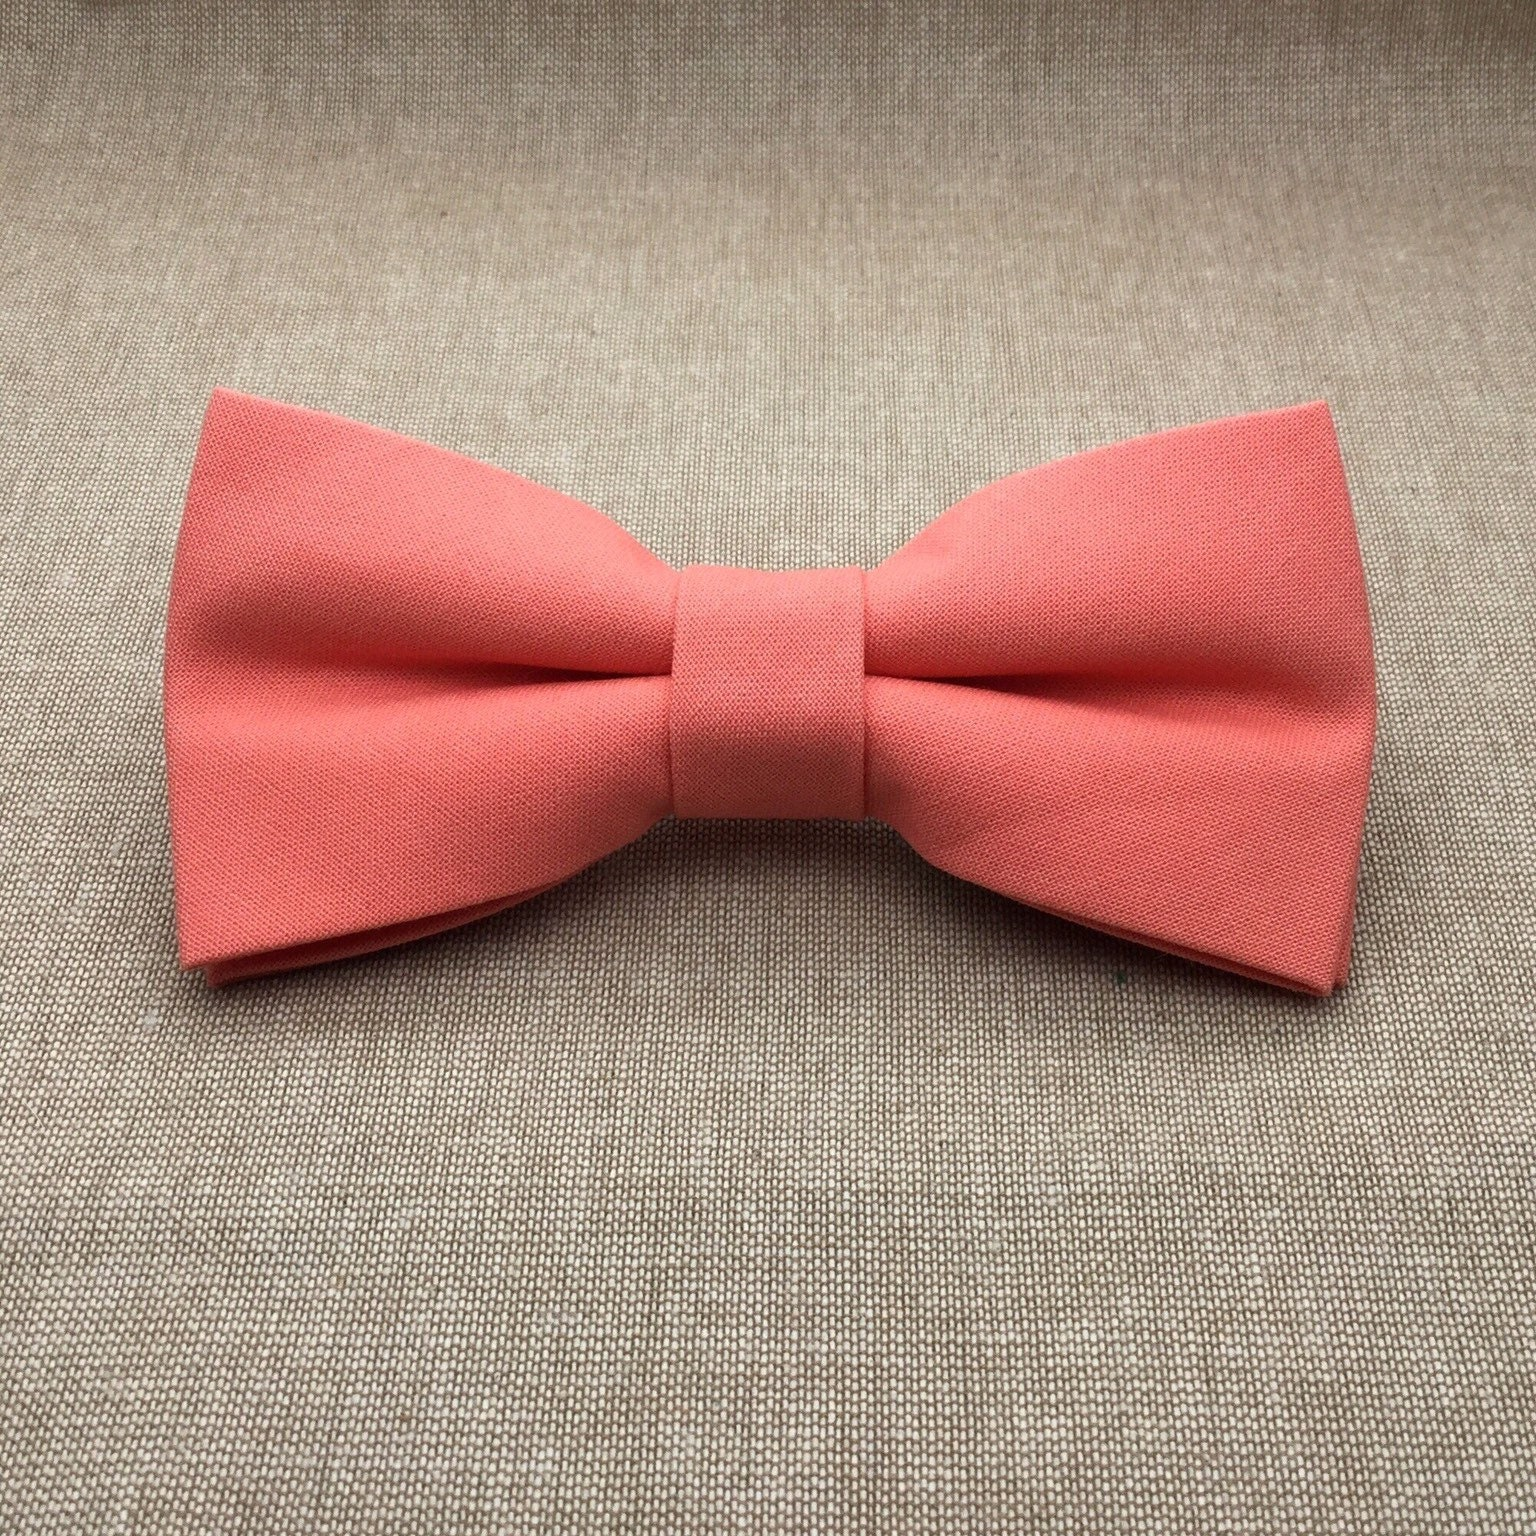 Premium Bow Tie Satin Plain Solid Mens Adjustable Bowtie FREE Pocket Square